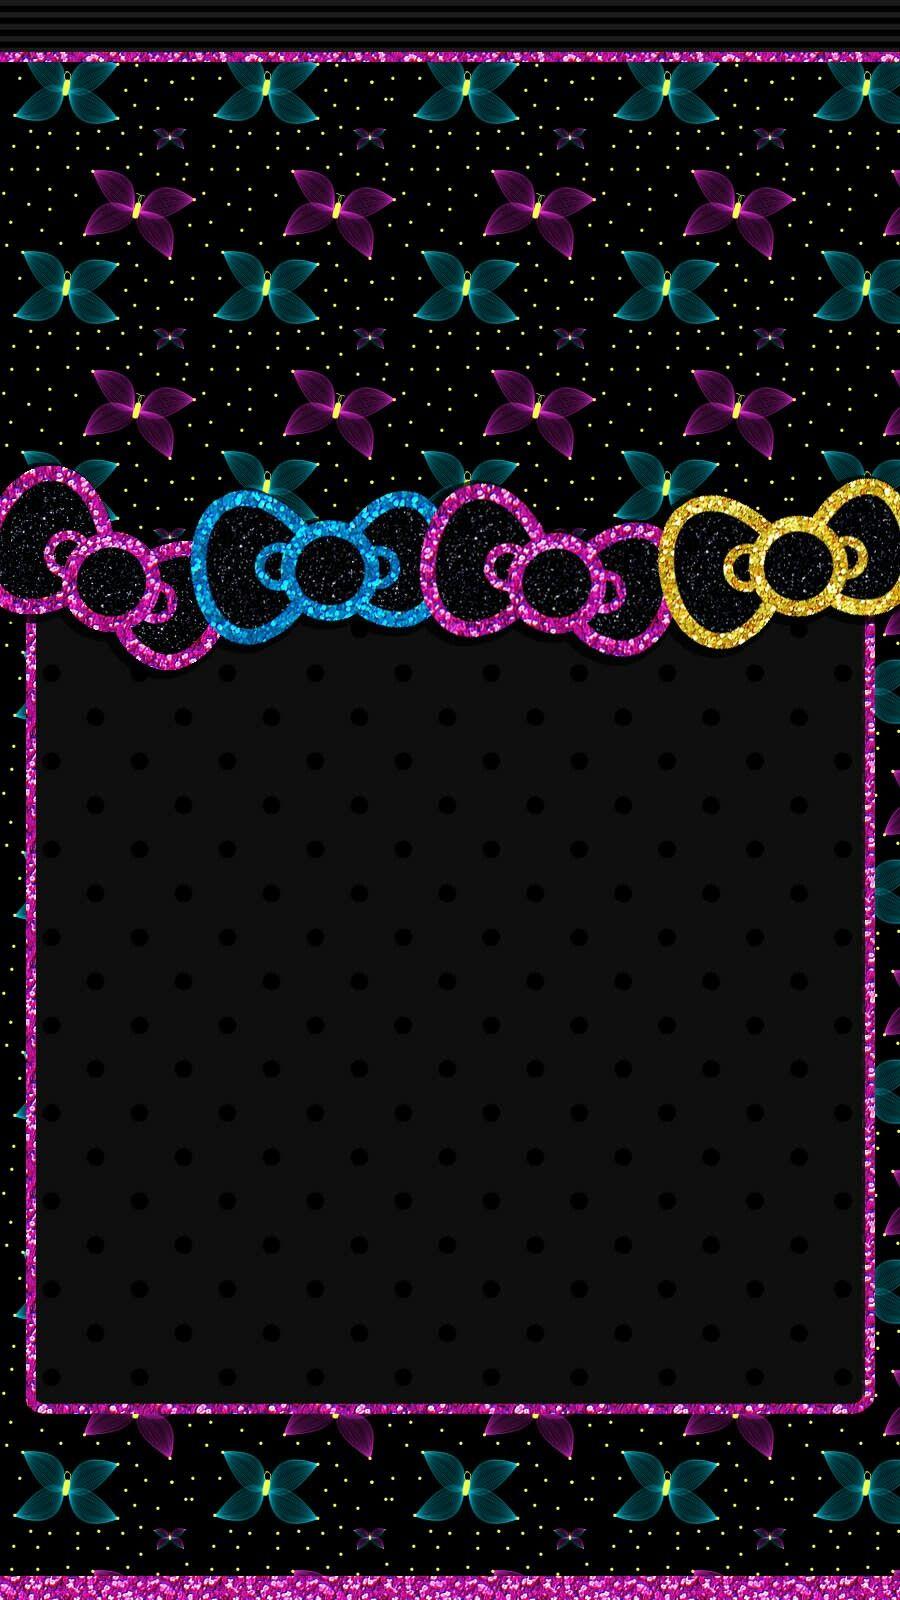 Wonderful Wallpaper Hello Kitty Dark Pink - e75d330f0209b2de845111e3449ef115  Pic_246371.jpg